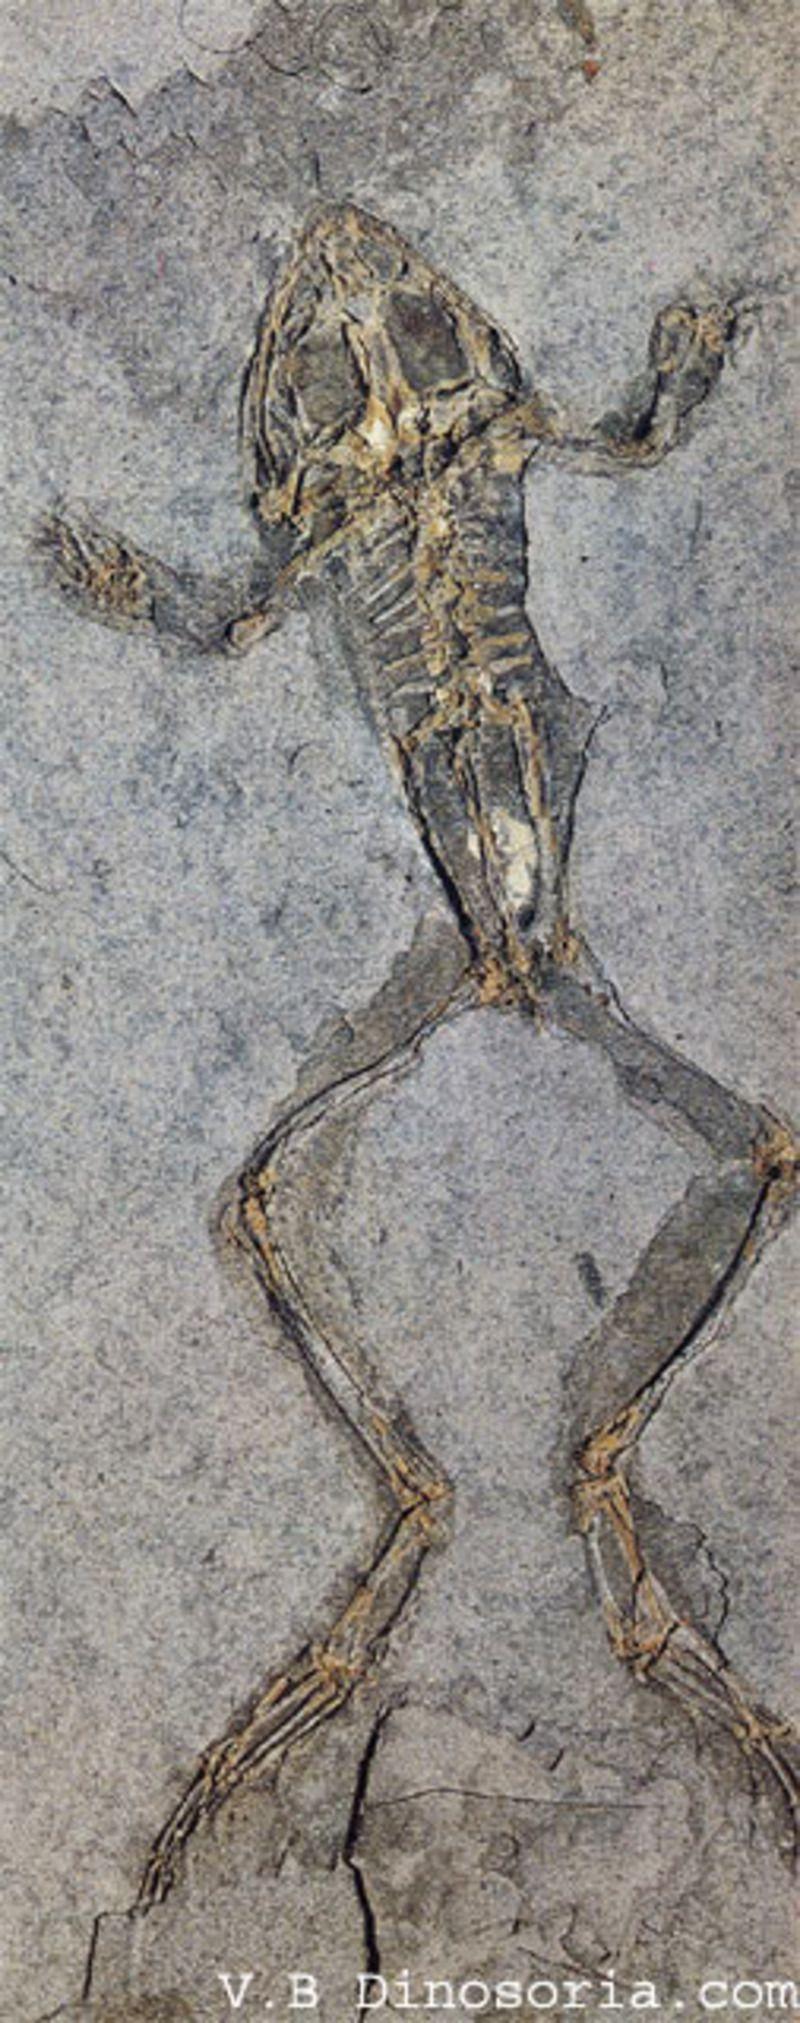 grenouille-fossile-201f771.jpg